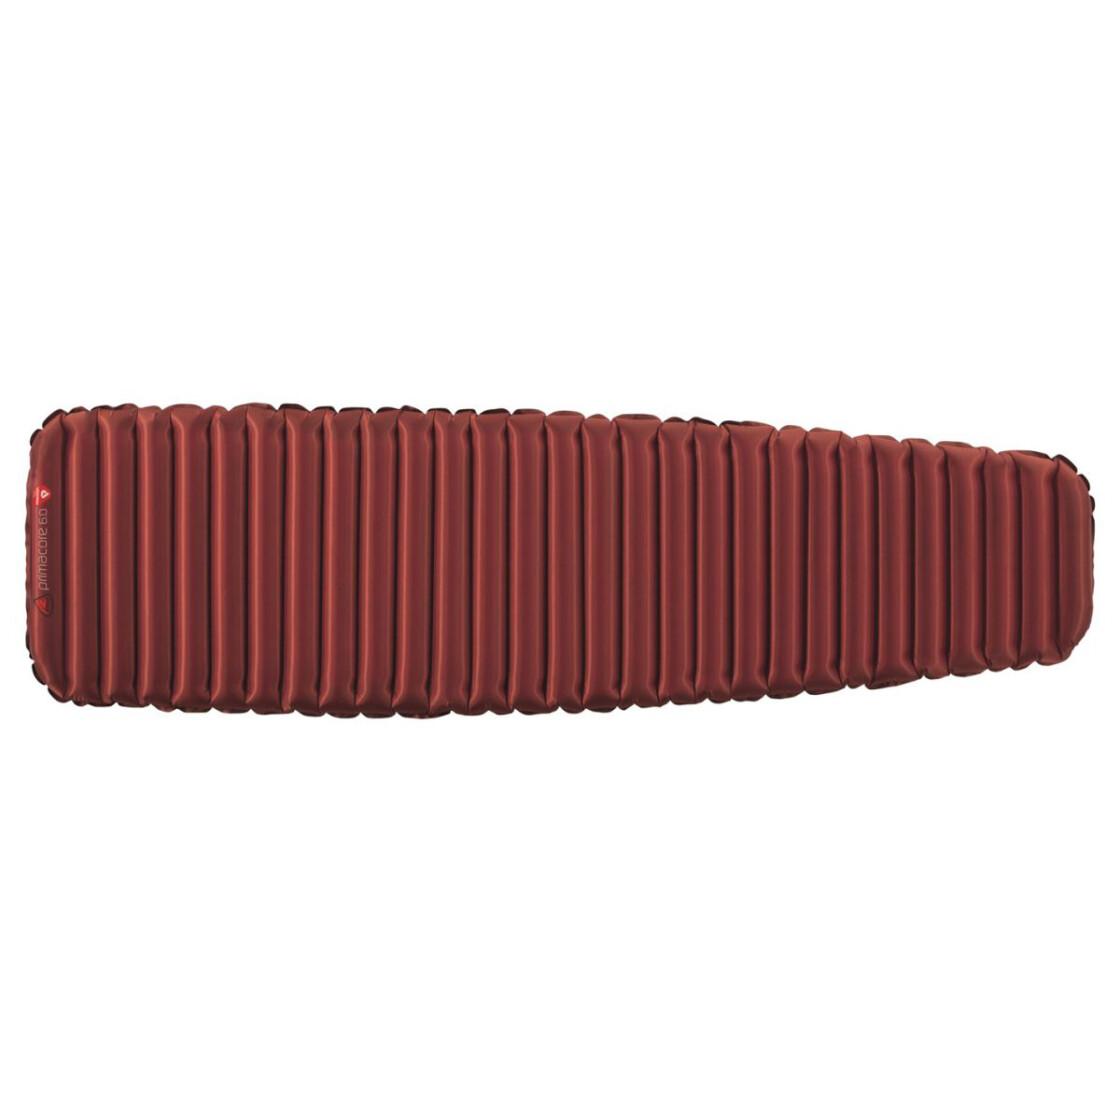 robens luftmatratze 39 prima core 39 outdoor ausr stung rucks cke ca. Black Bedroom Furniture Sets. Home Design Ideas